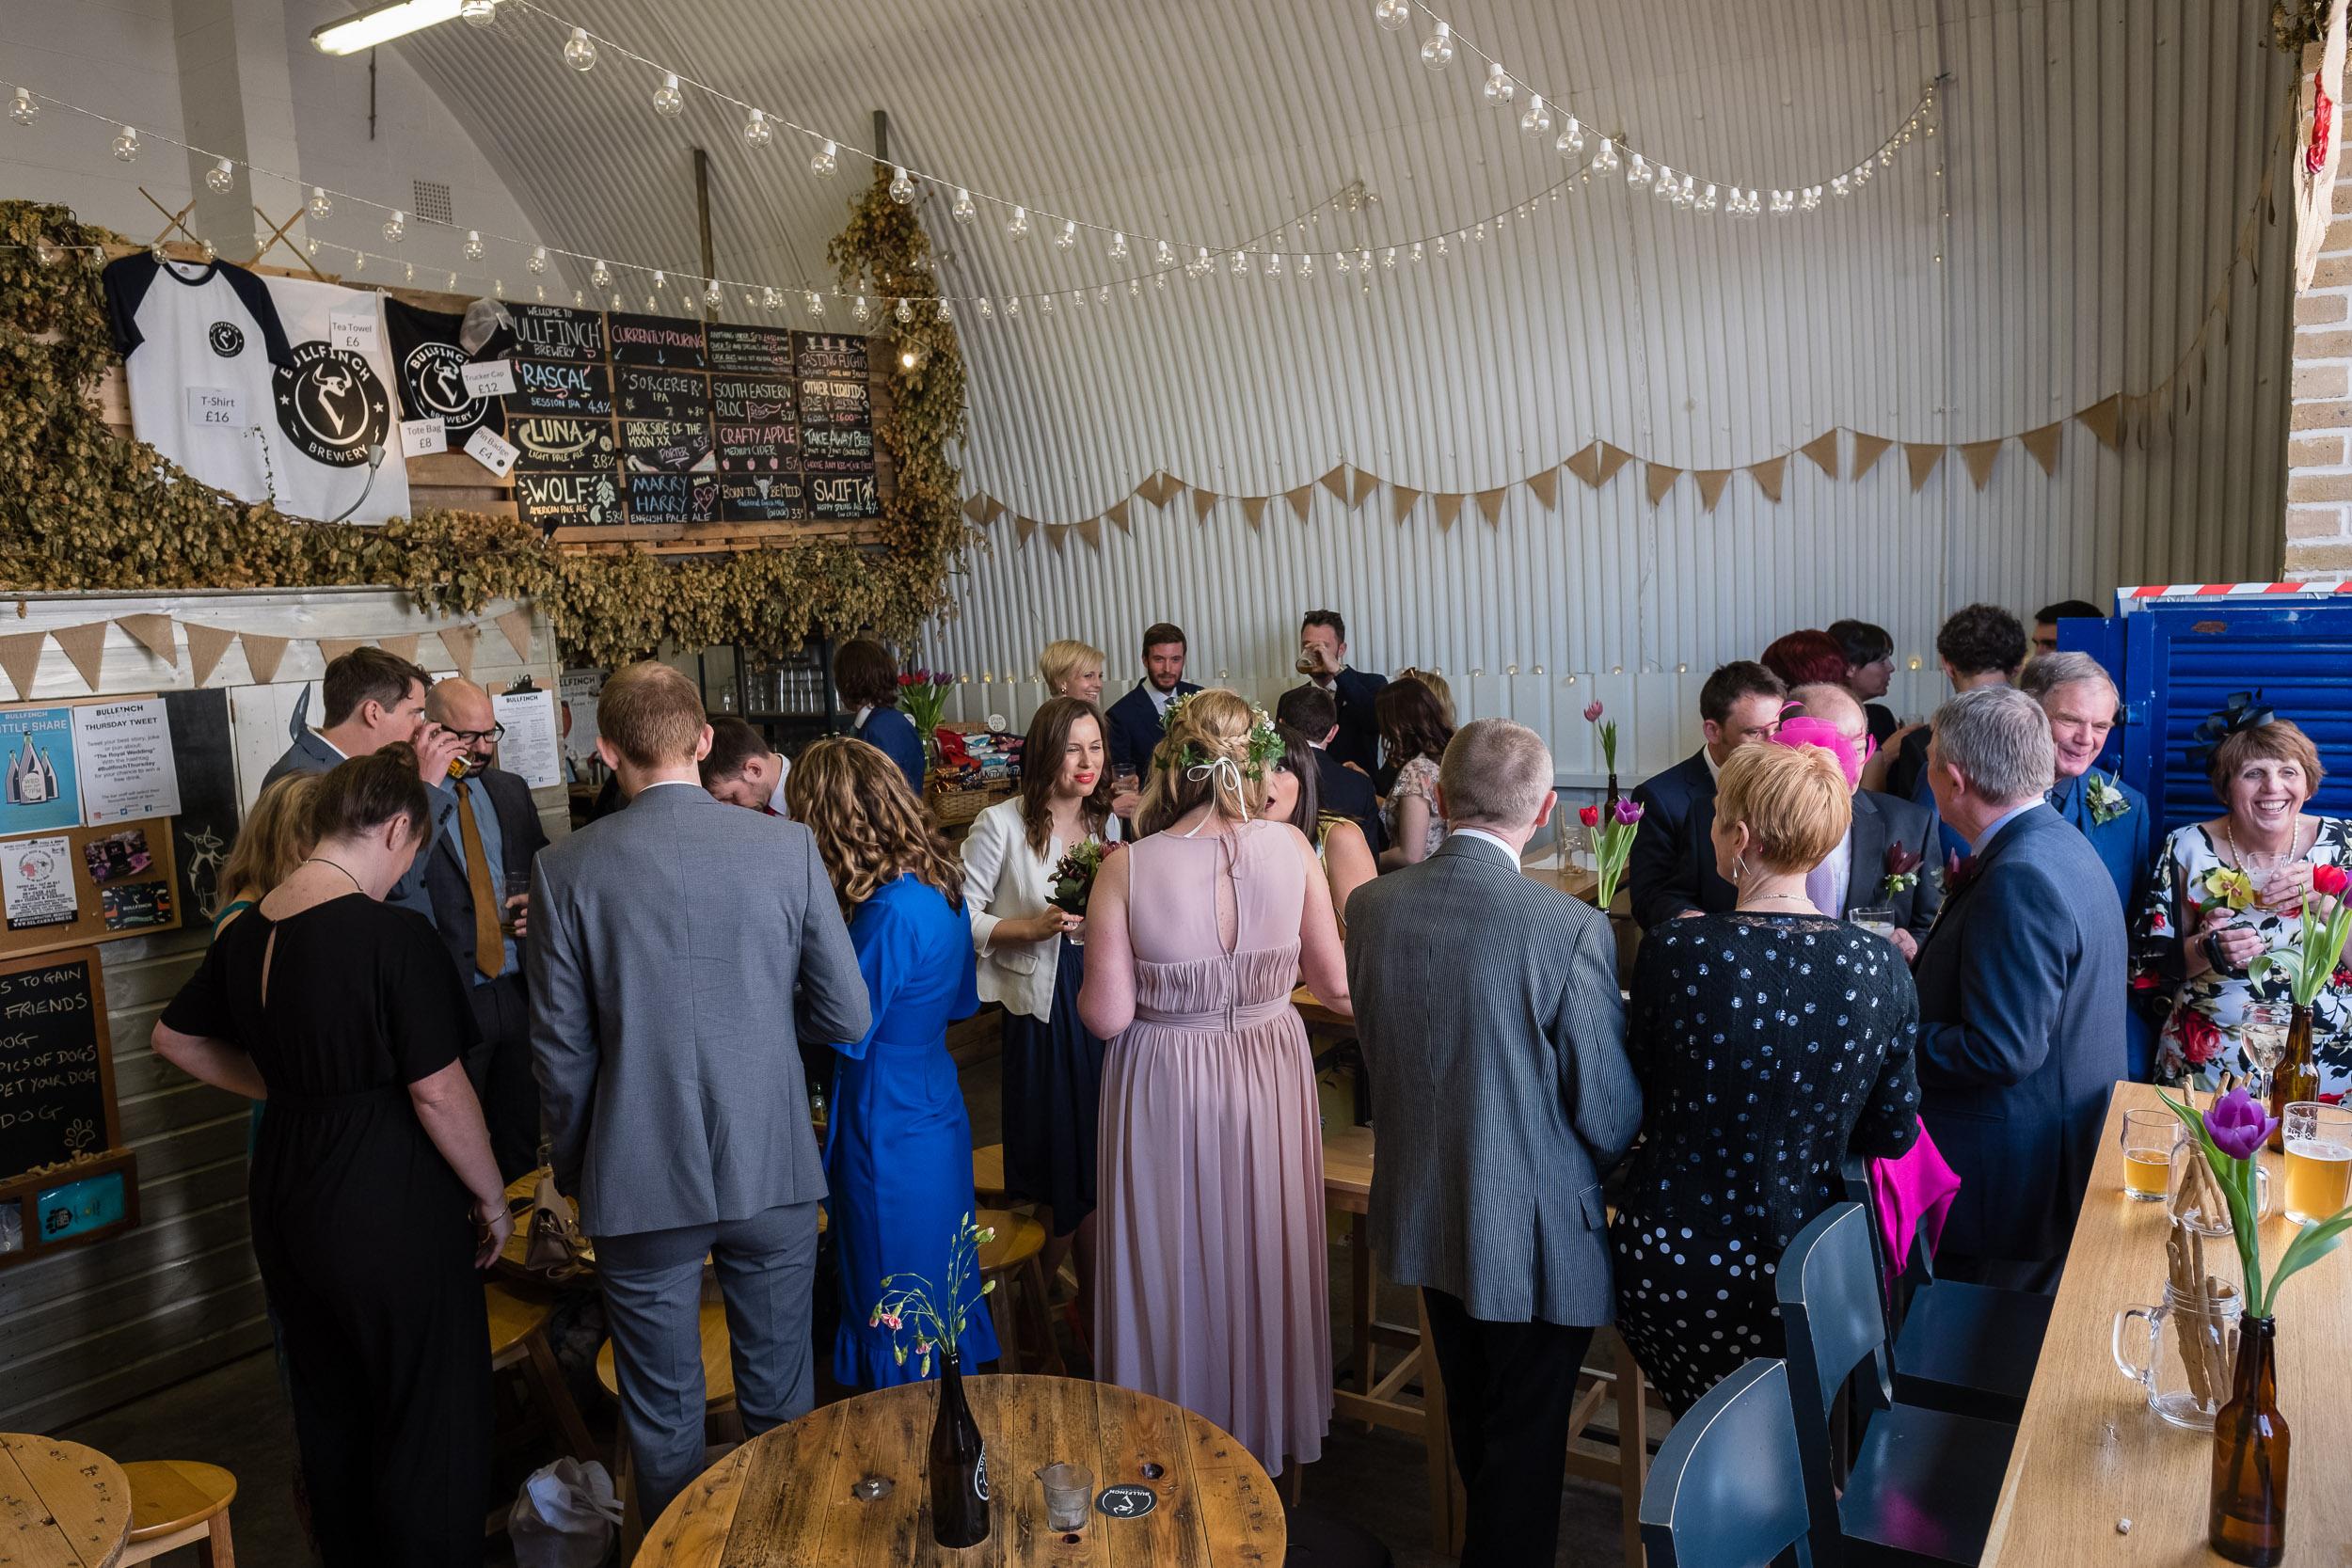 brockwell-lido-brixton-herne-hill-wedding-060.jpg